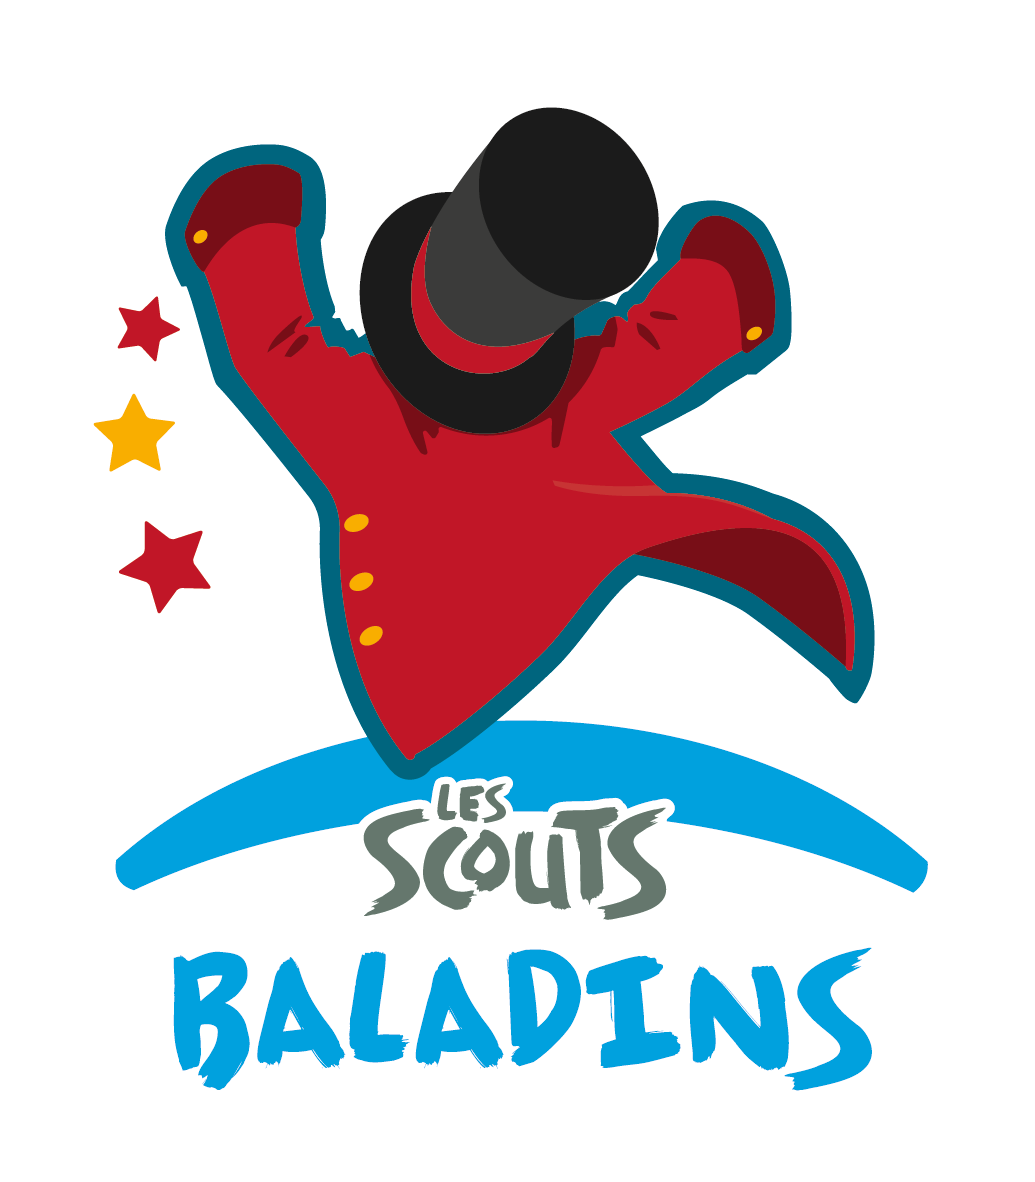 Branches_Logos_2018_Baladins_Quad_Protection.png